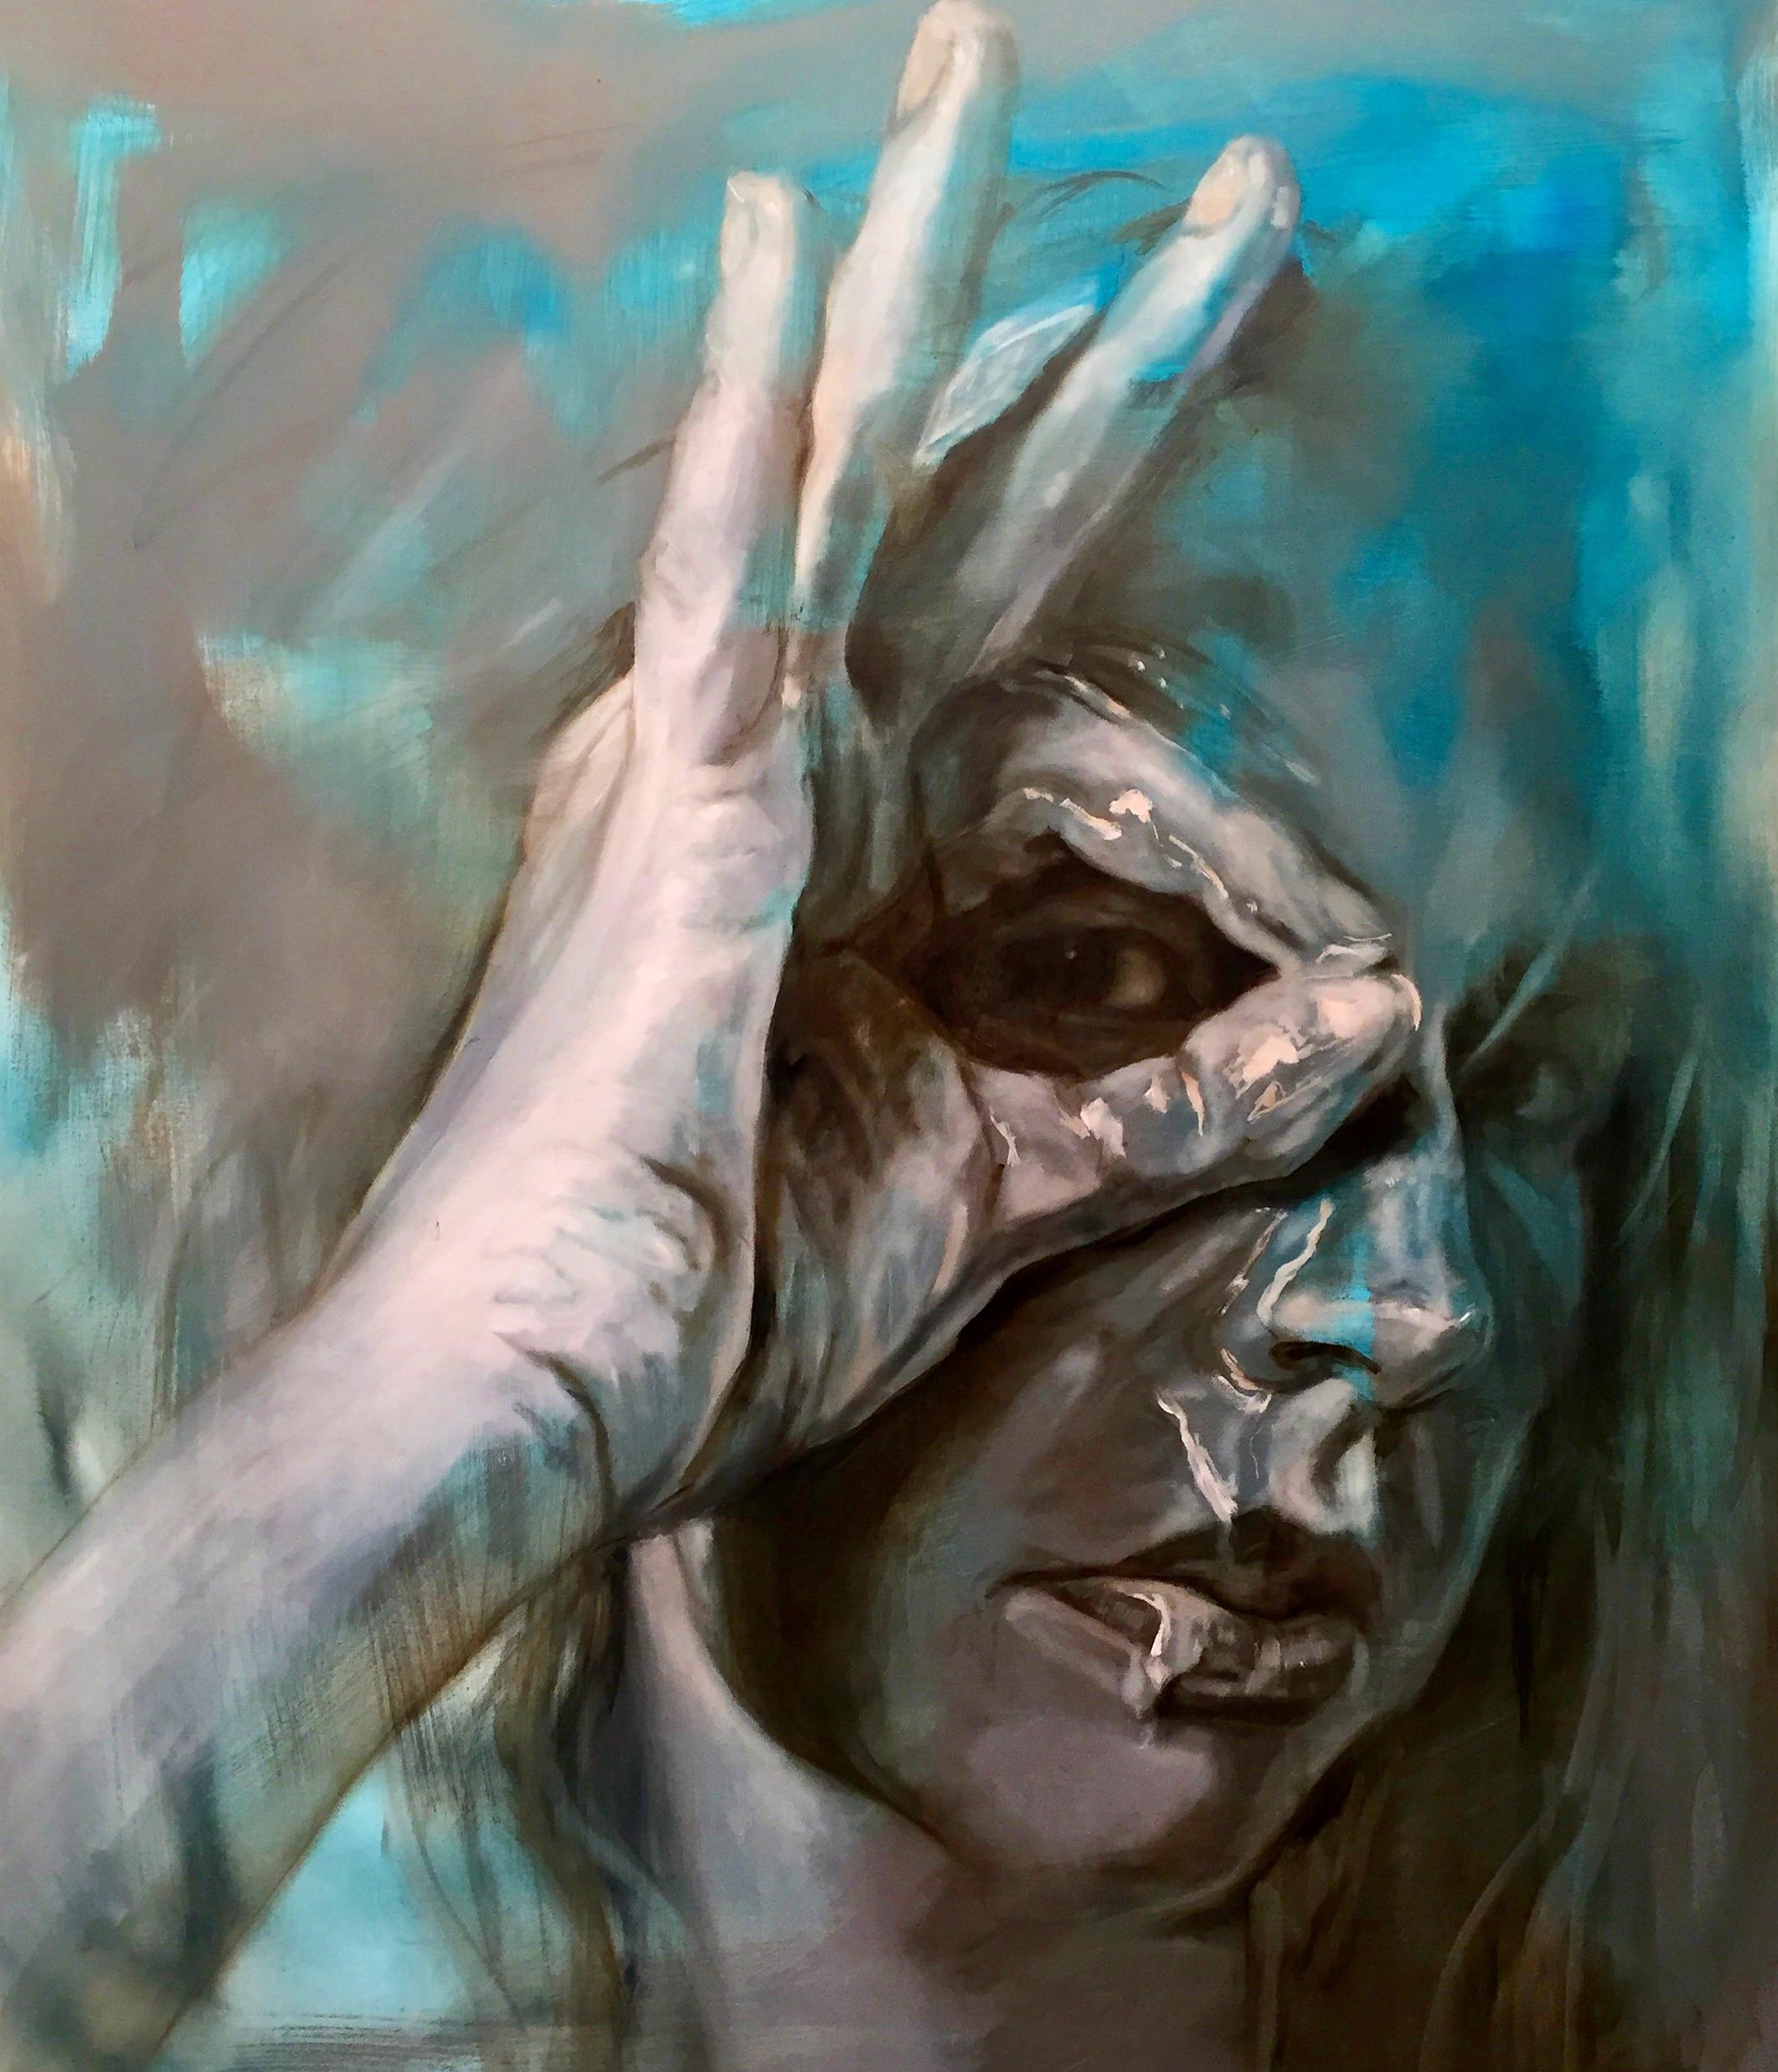 Eye-Spy, 100x120cm, Oil on Canvas